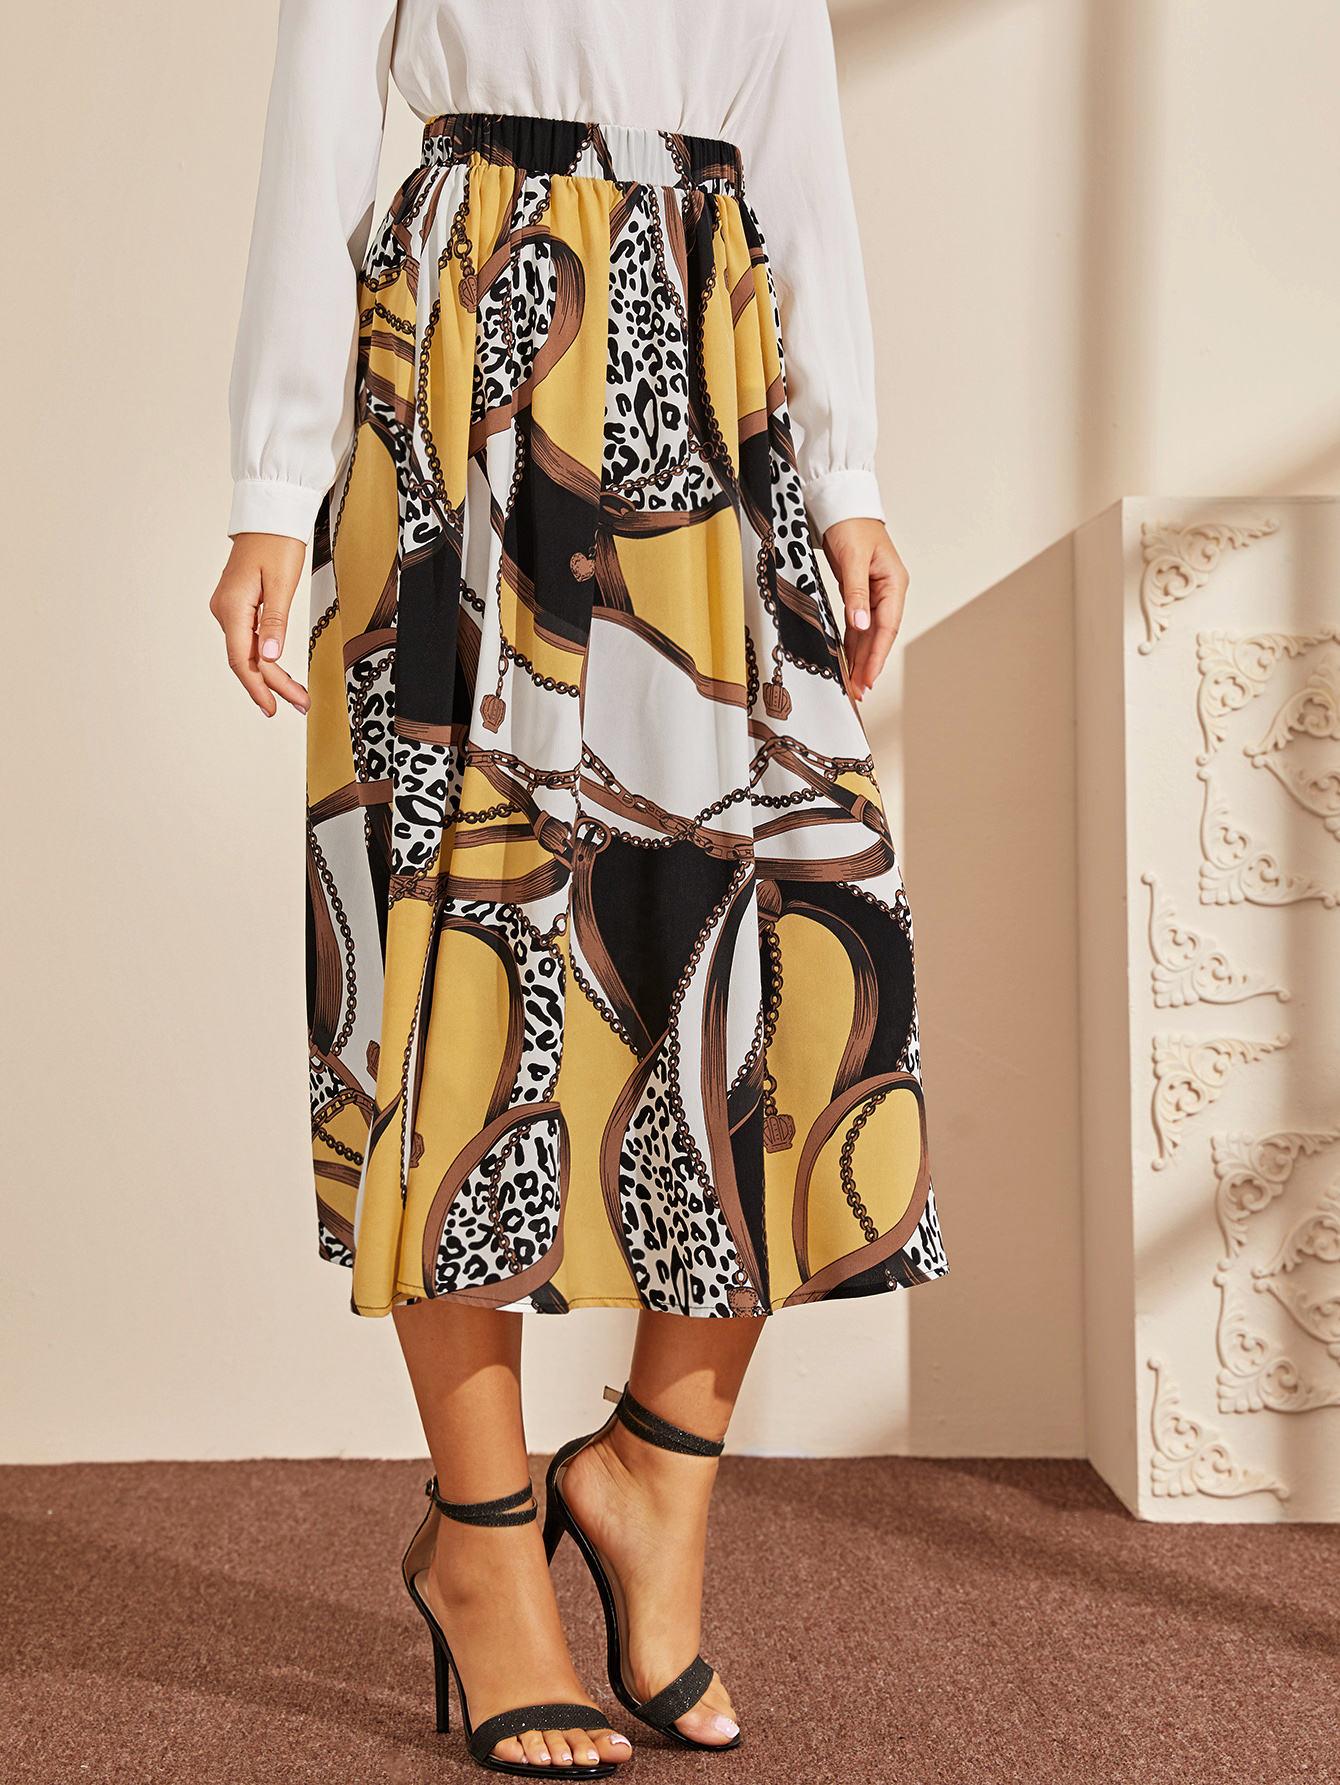 Леопардовая юбка с графическим принтом на резинке